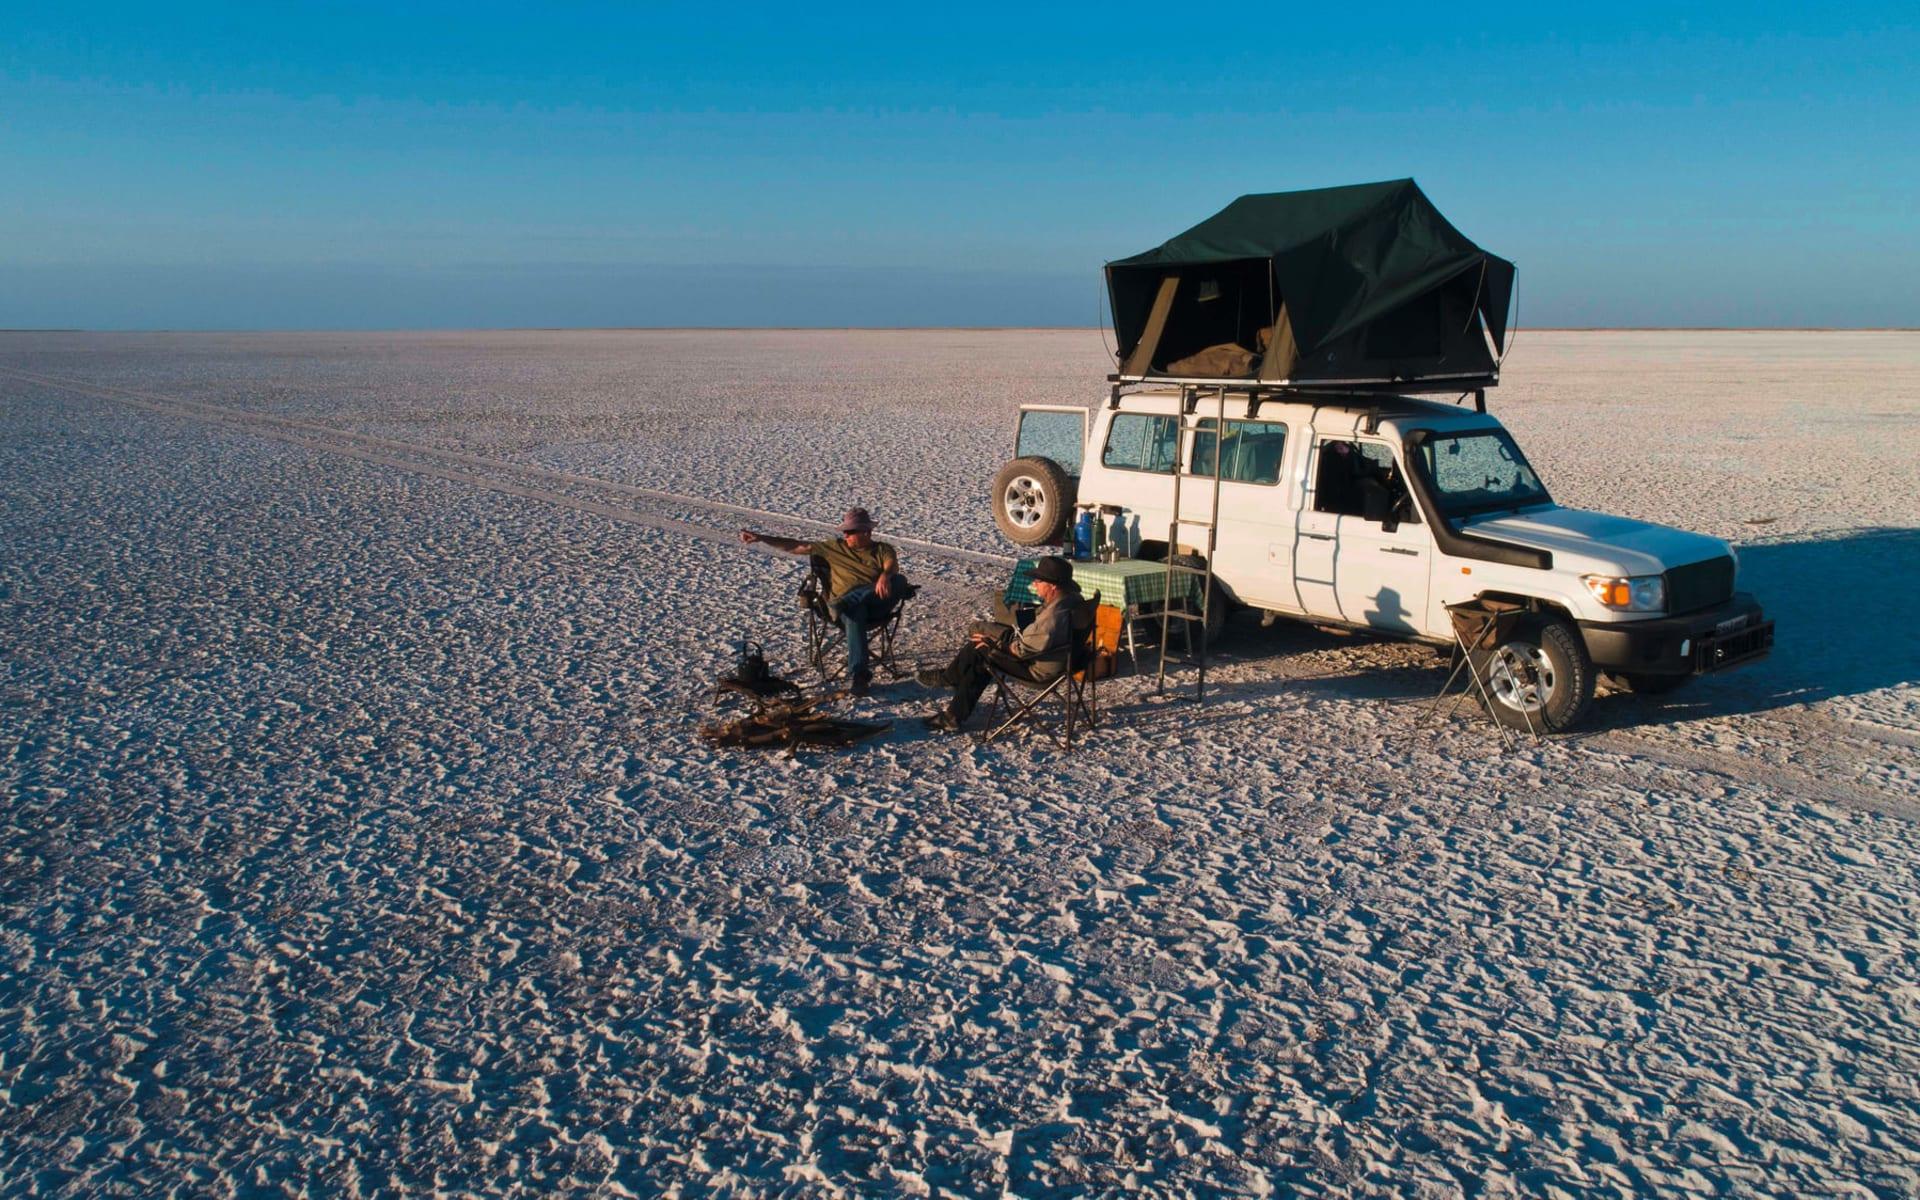 Botswana Off Road Safari inkl. Verlängerung ab Maun: fz Travel Adventure - Camping Pfanne